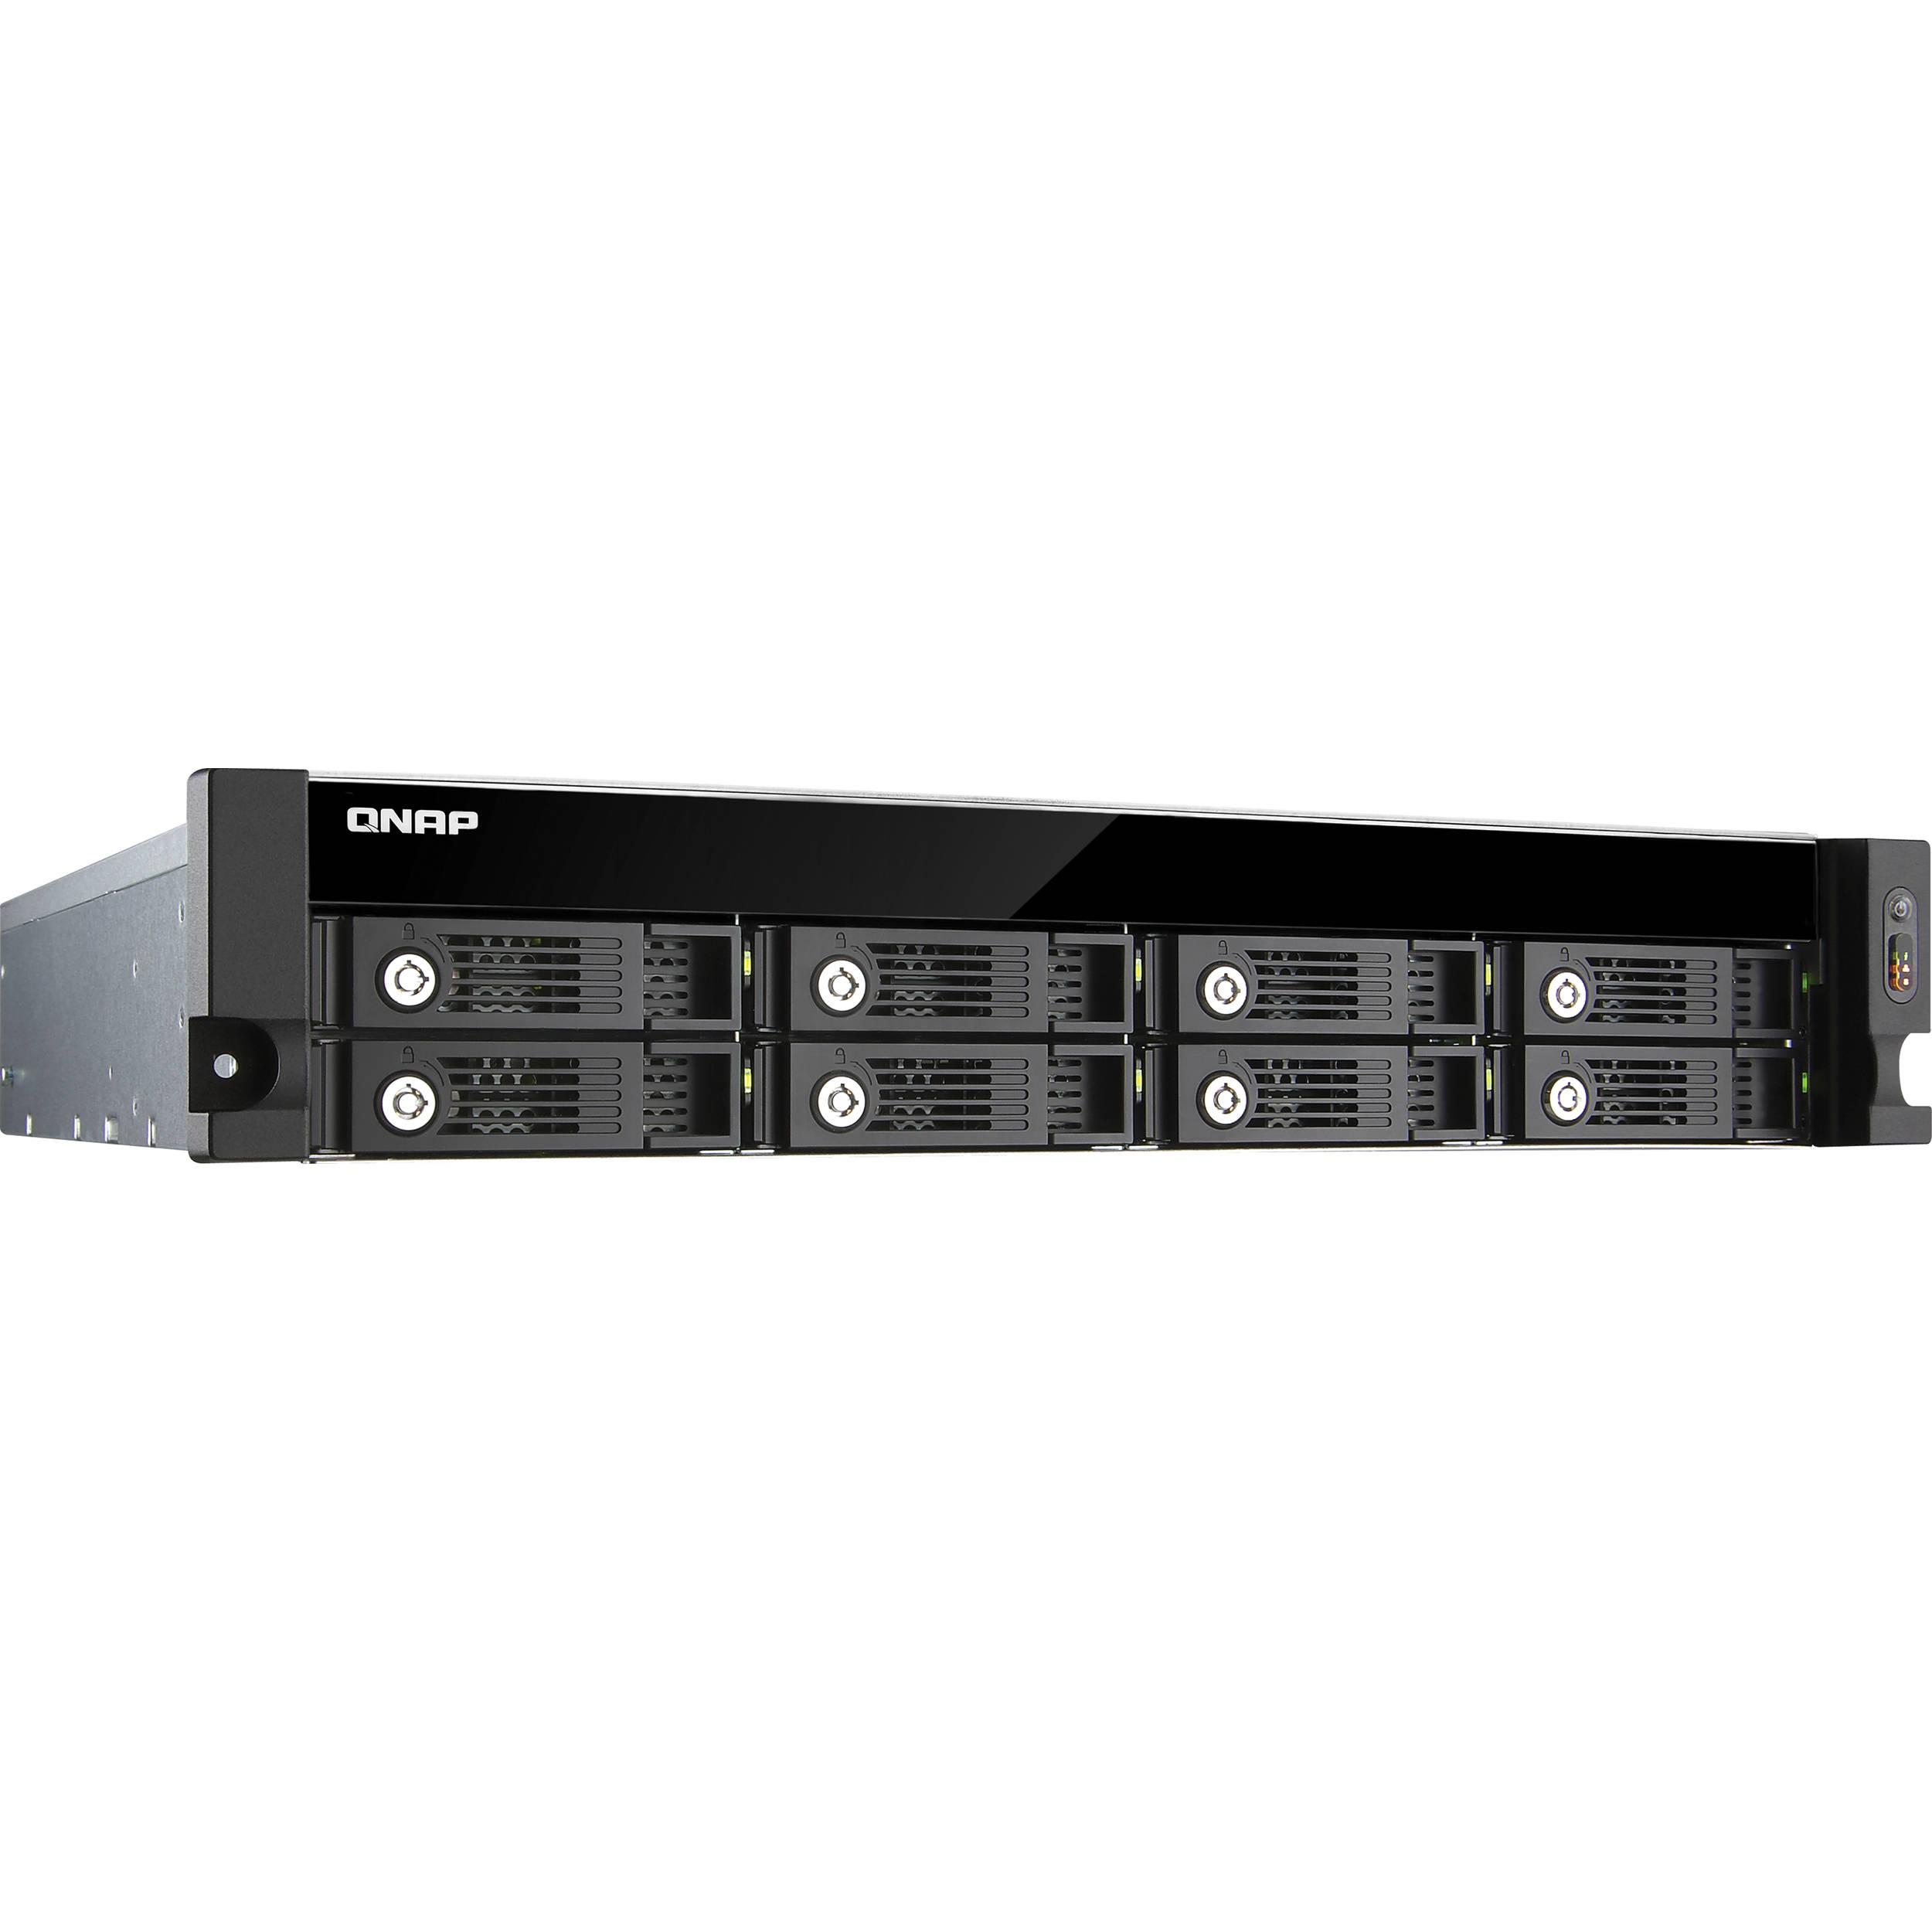 c product REG Qnap TS US TS Turbo NAS Server.